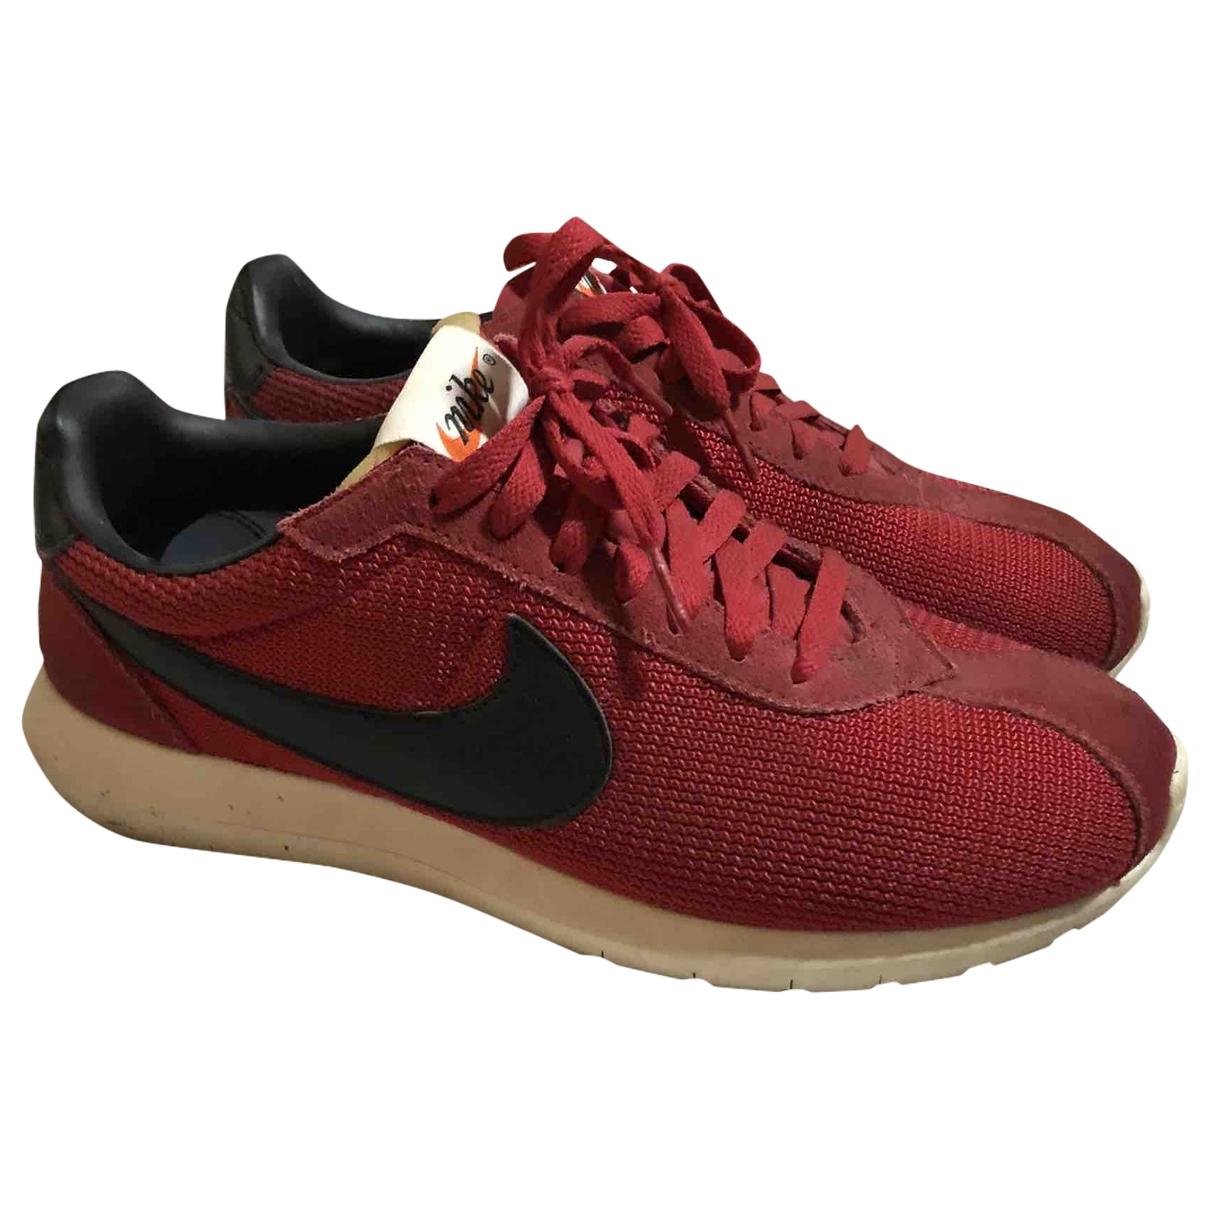 Nike - Baskets Roshe Run pour homme en toile - rouge